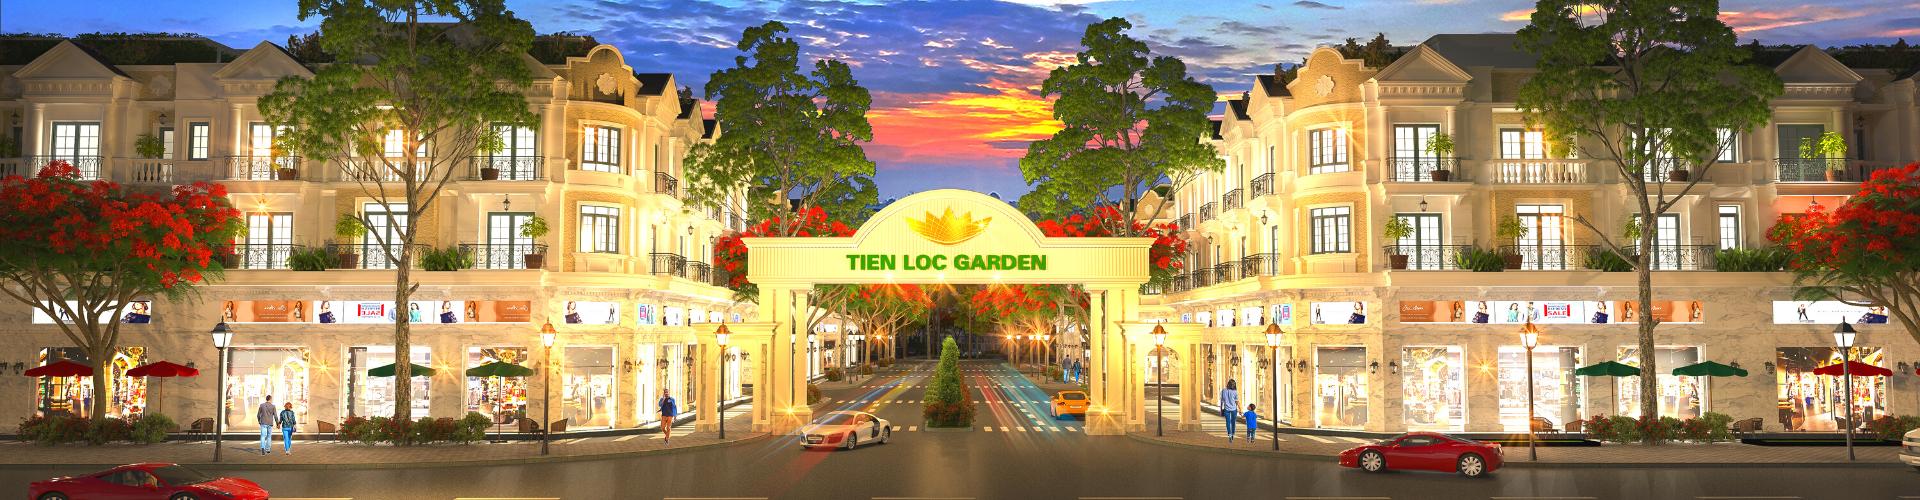 Tiến Lộc Garden